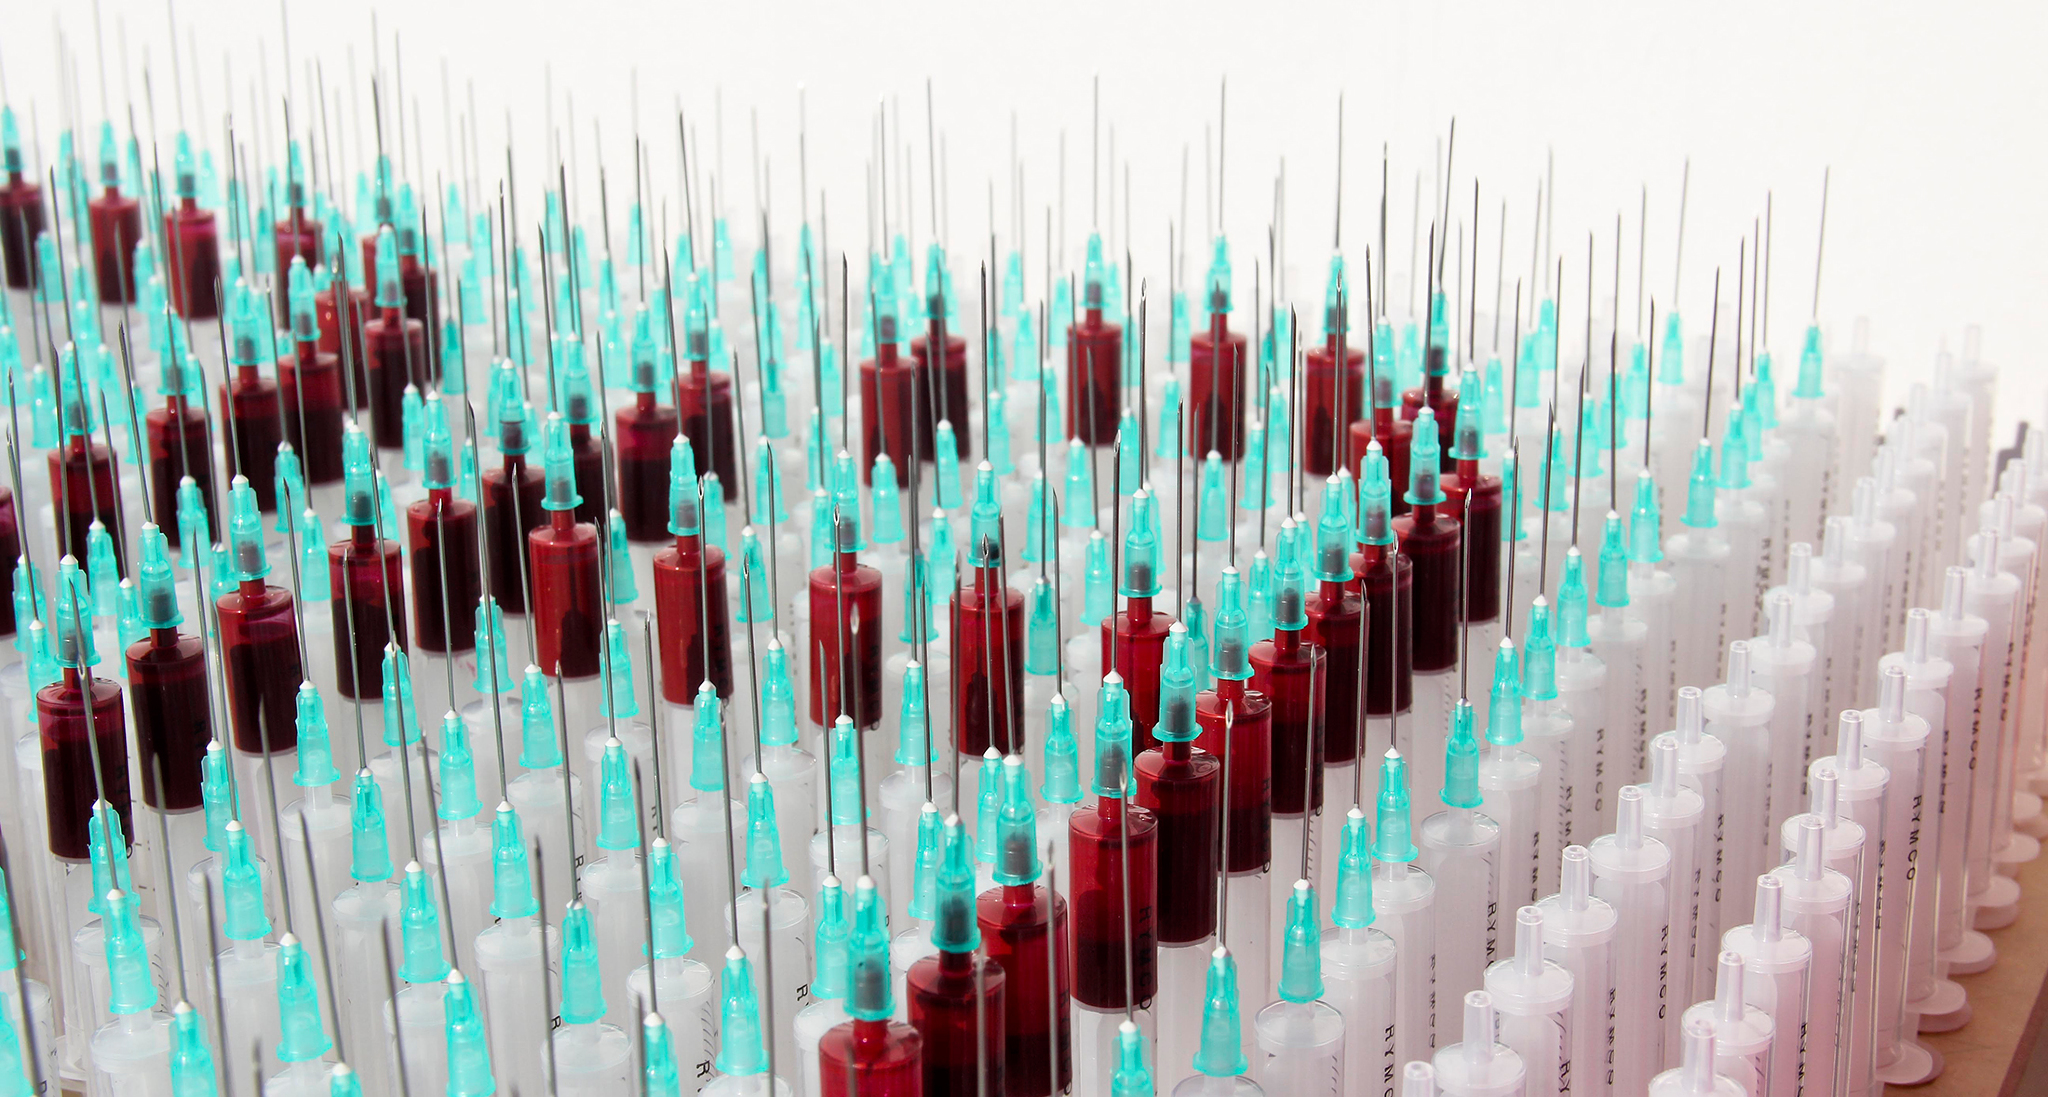 syringes-typography-by-camilo-rojas 2_o.jpg